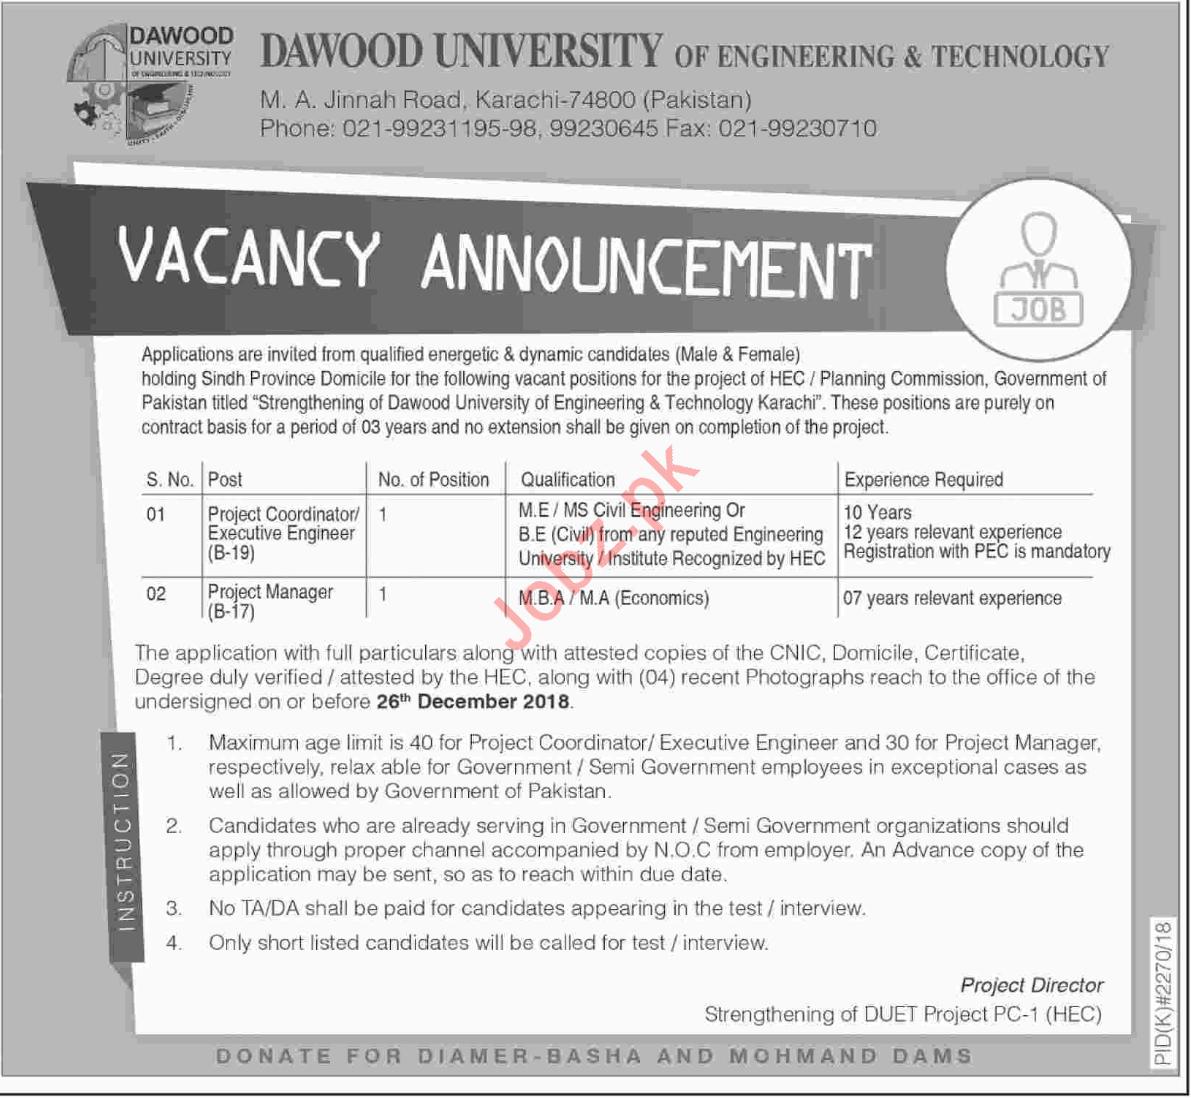 Dawood University Jobs 2019 in Karachi